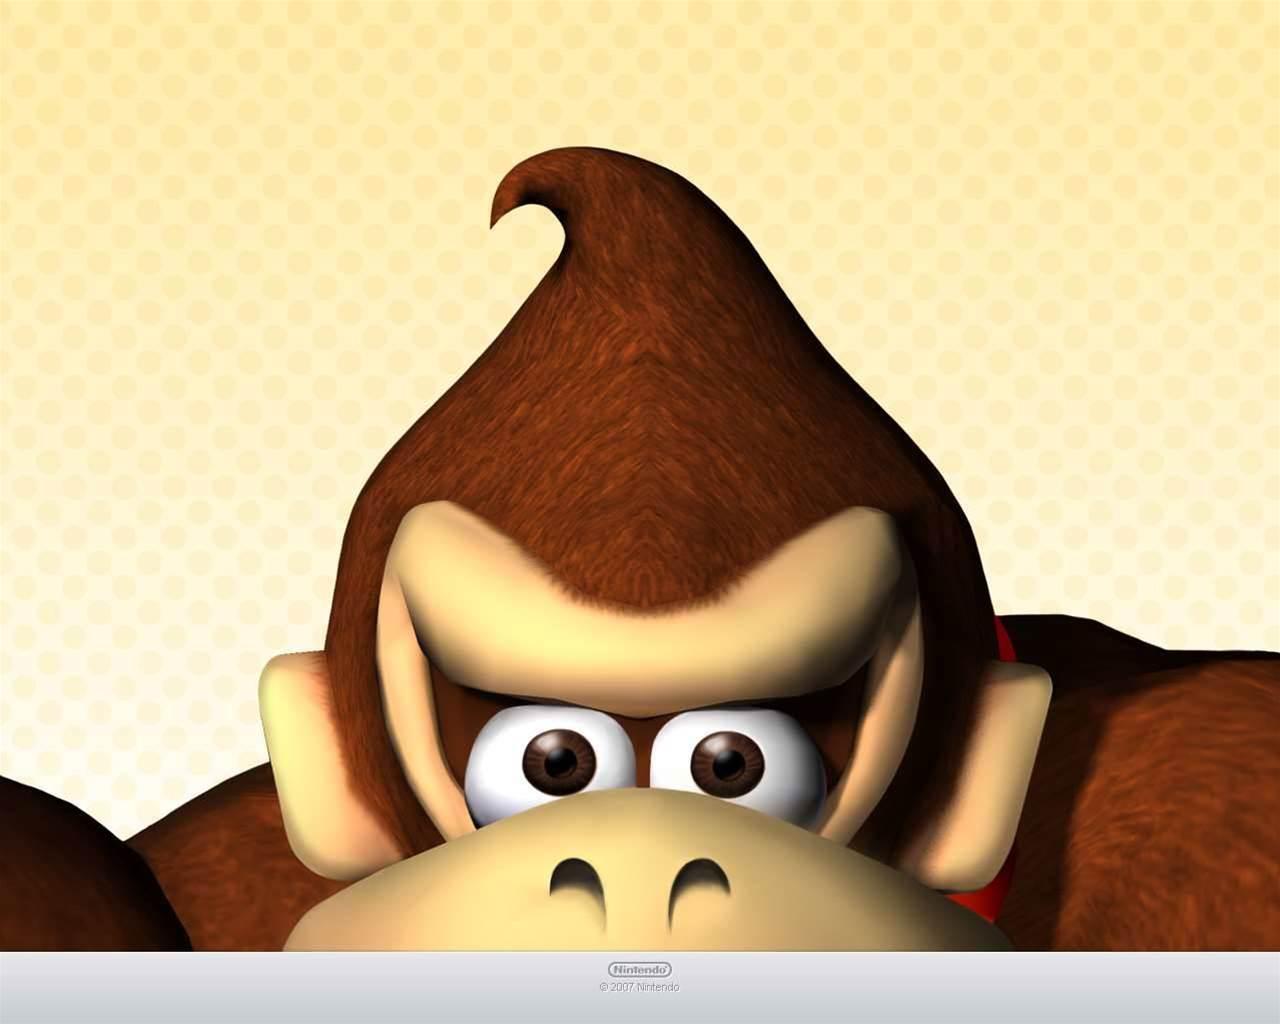 Donkey Kong turns 30